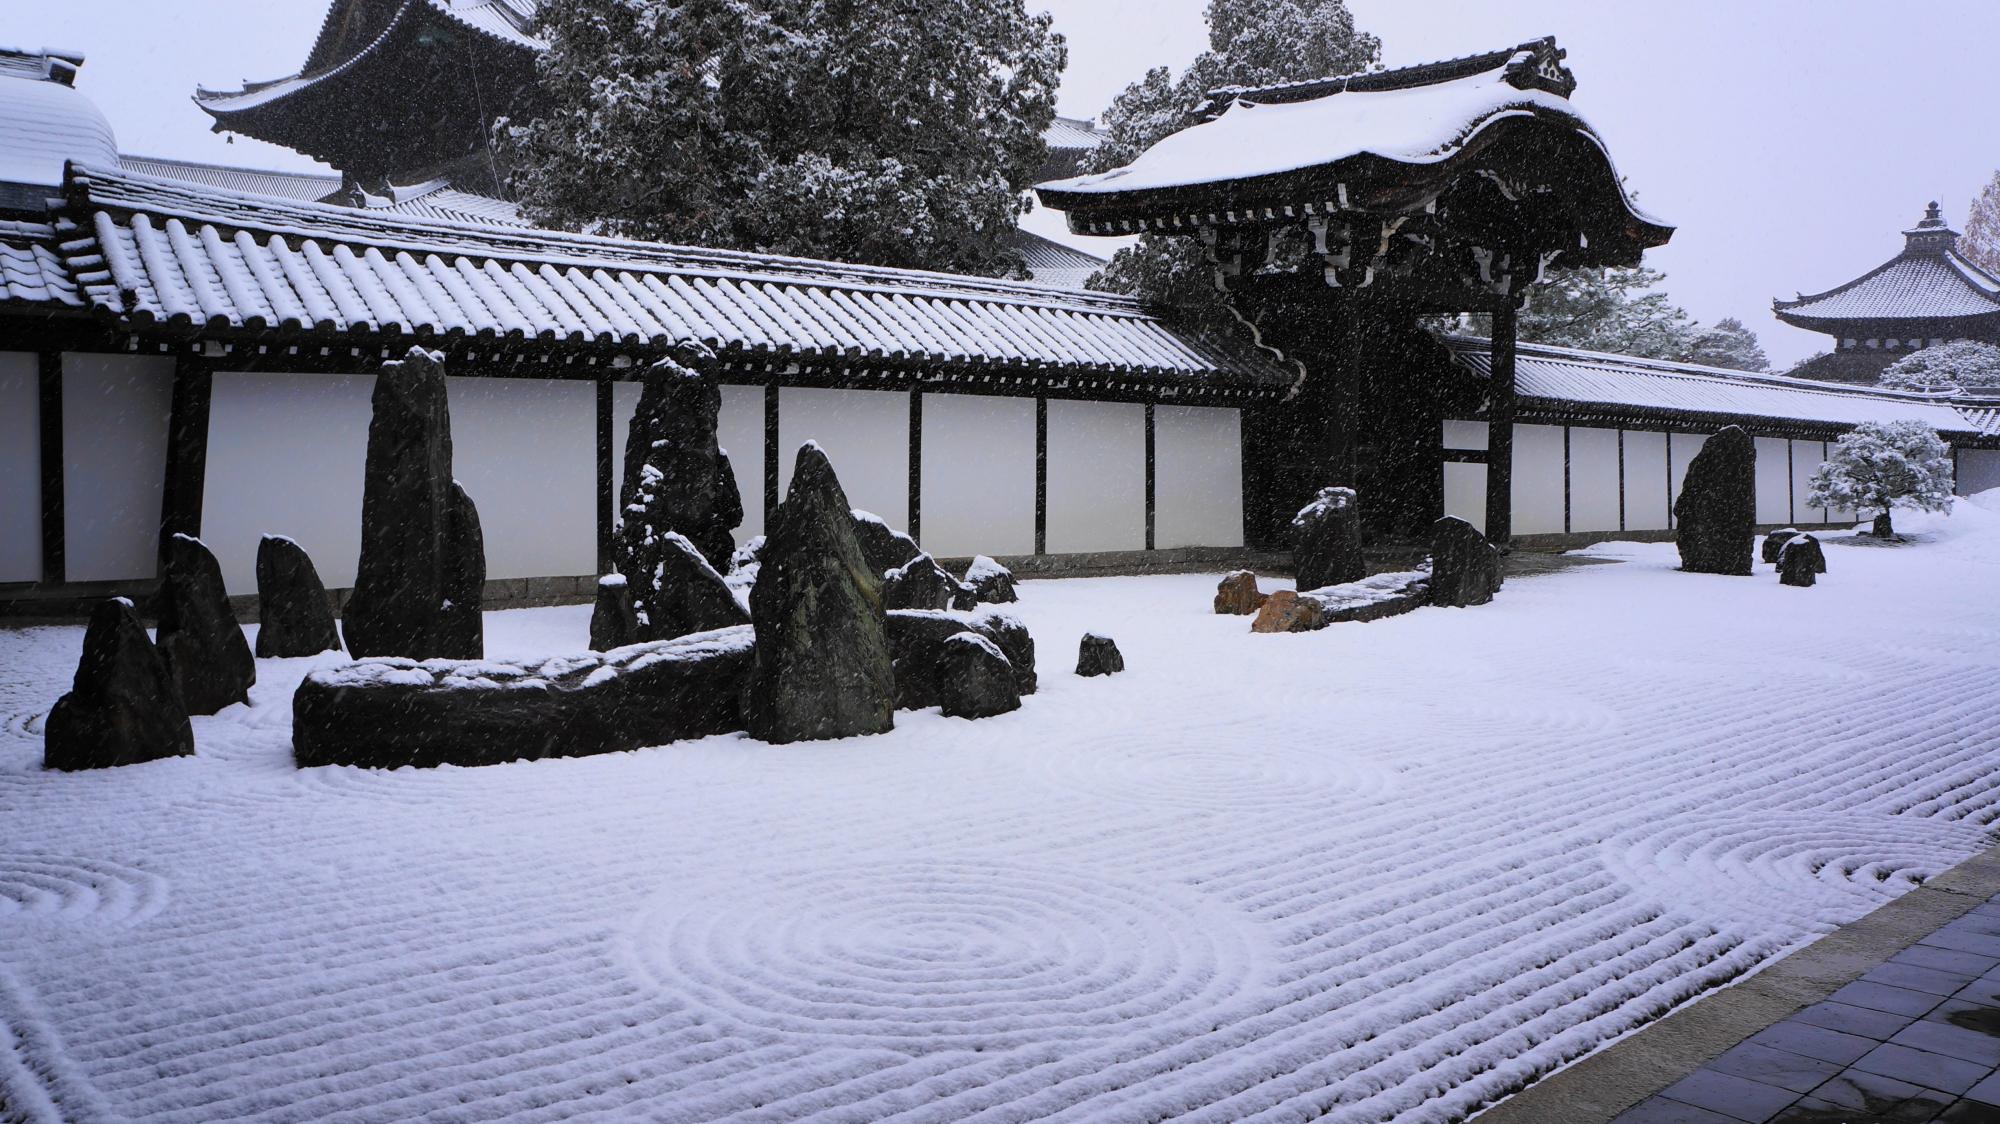 東福寺の方丈南庭(方丈庭園南庭)の雪景色